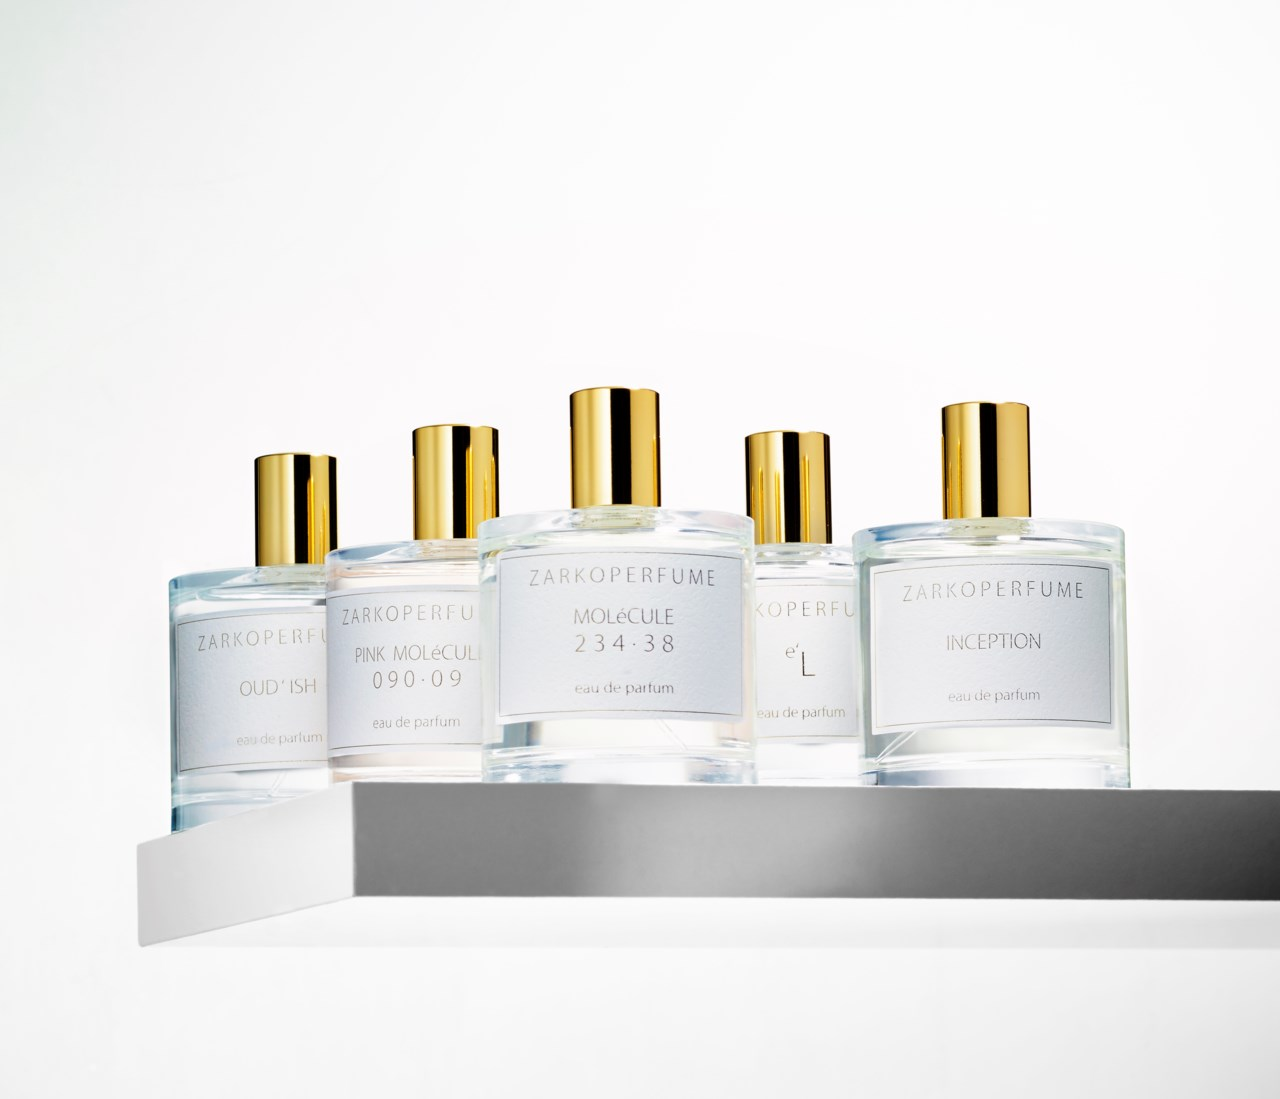 Zarkoperfumes